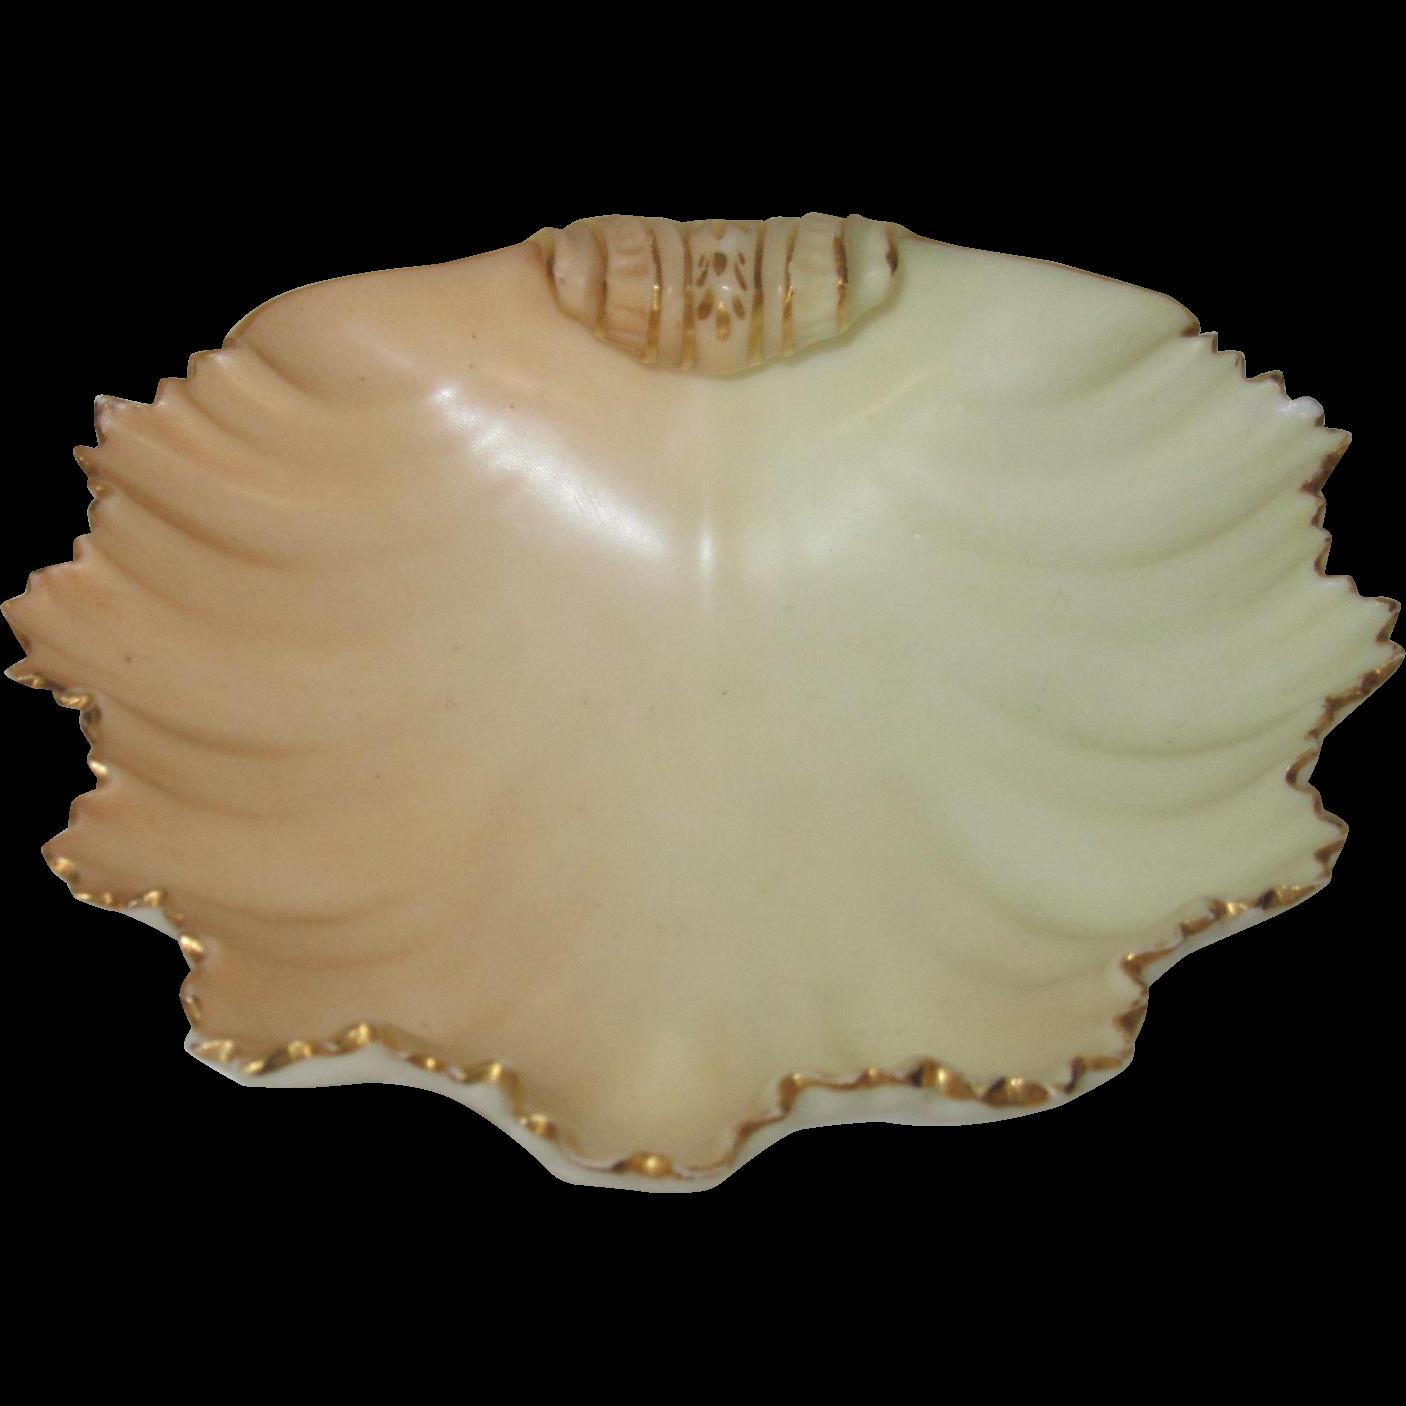 Royal Worcester Shell-Shaped Blush Ivory Bonbon Dish